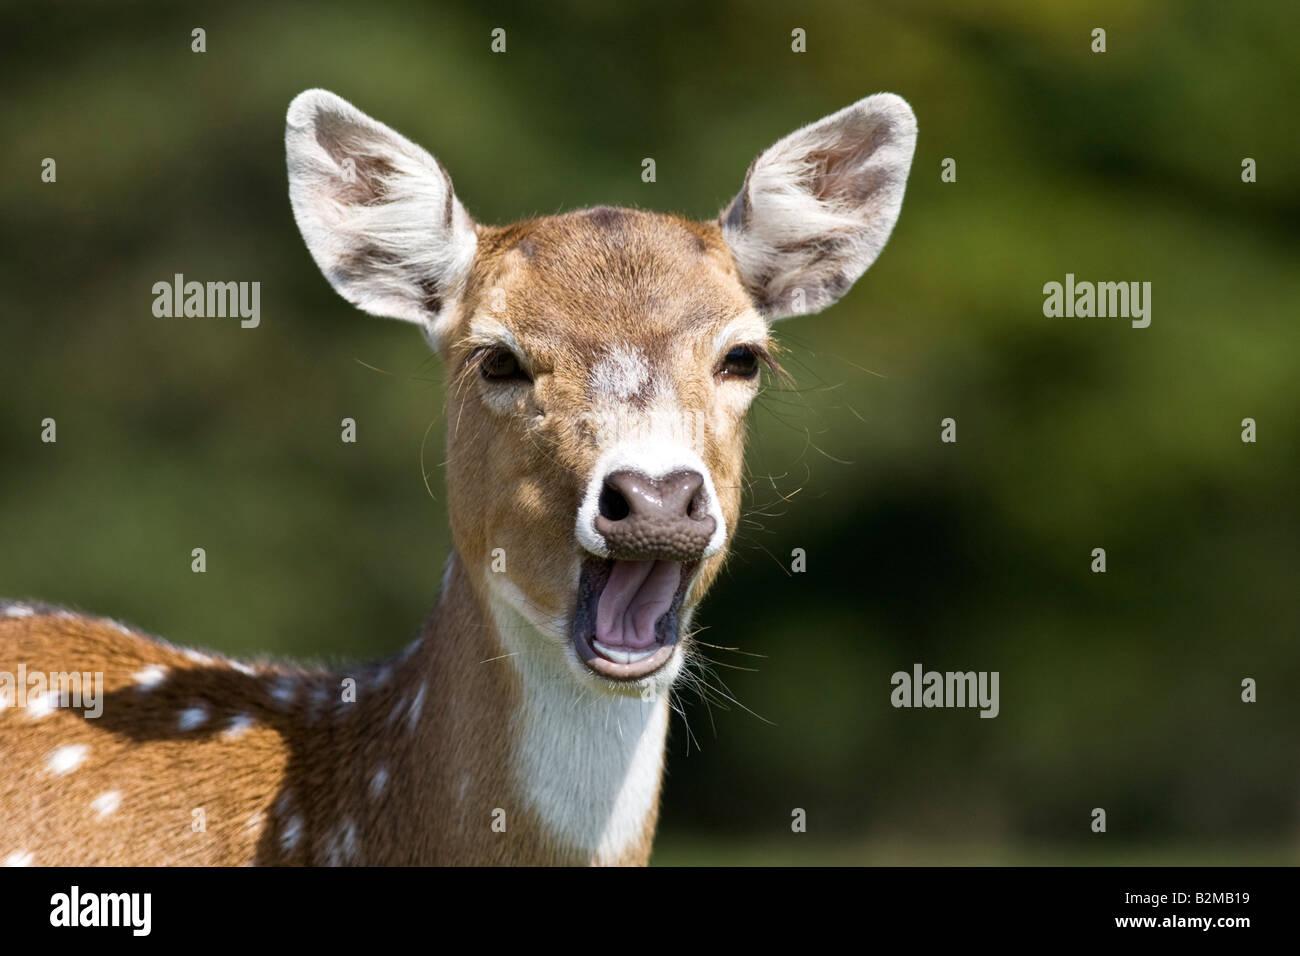 Axis Deer Yawning - Stock Image